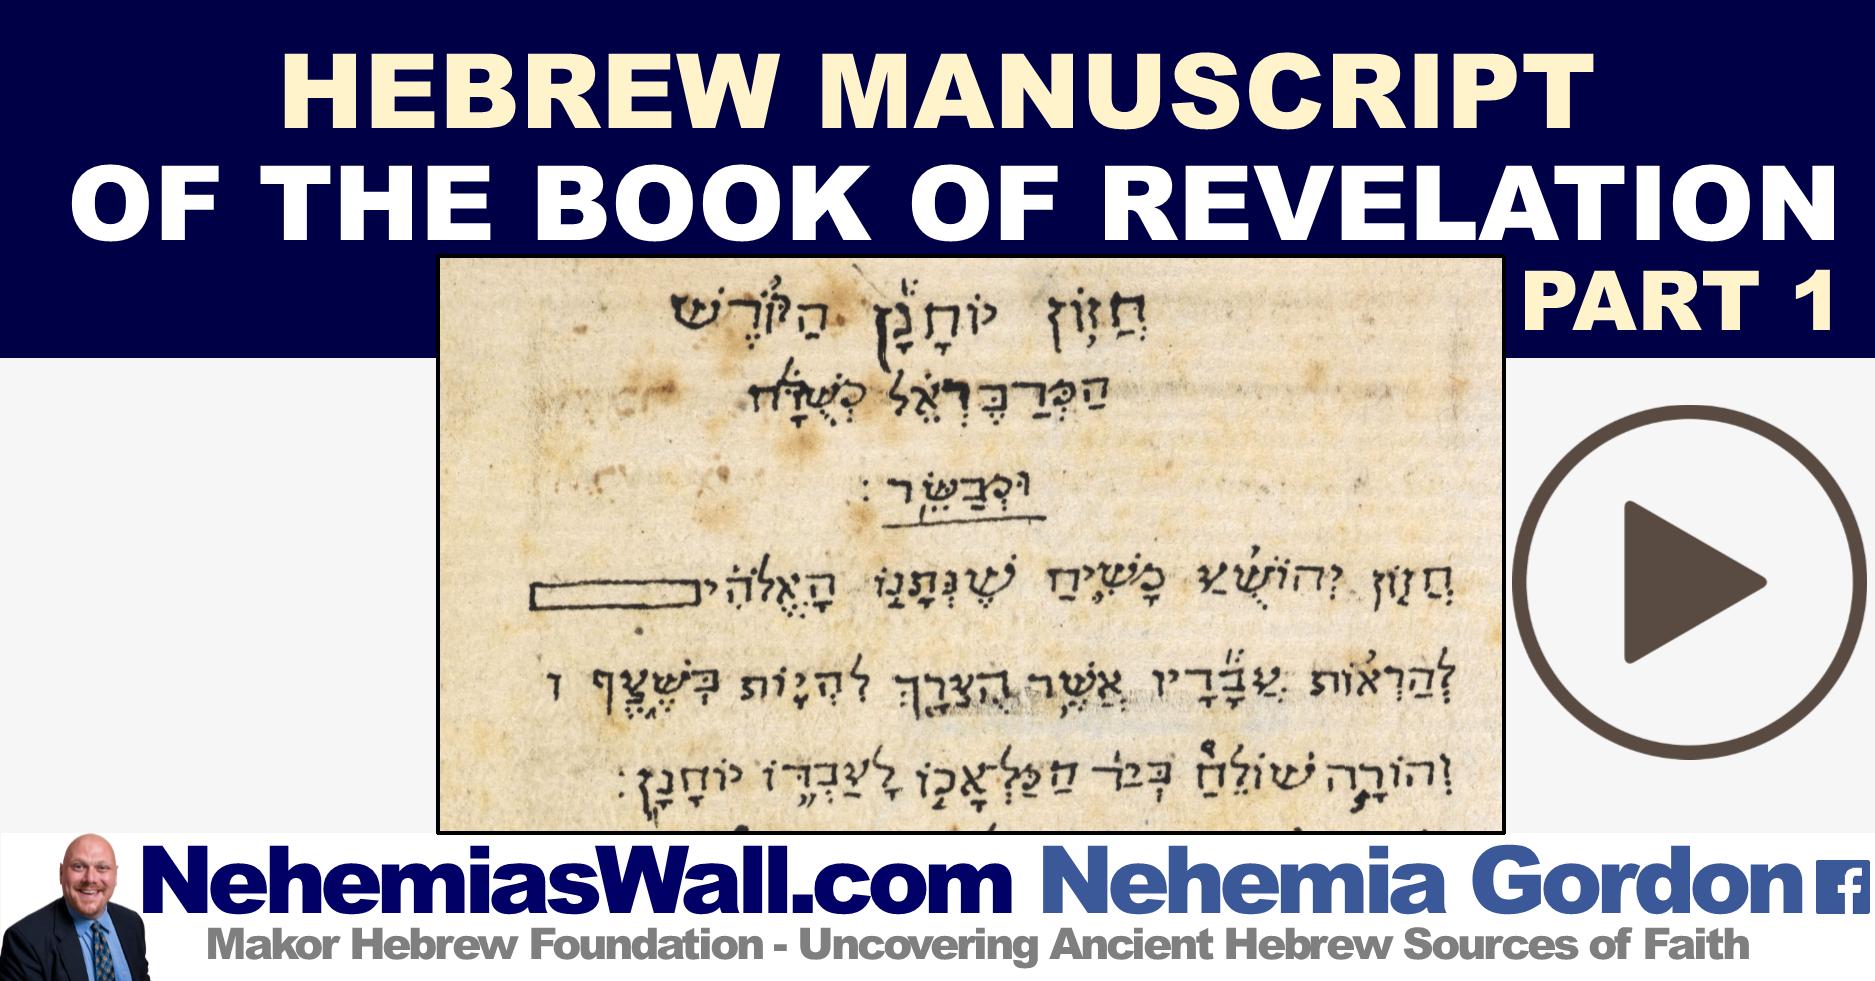 Hebrew M Cript Of The Book Of Revelation Part 1